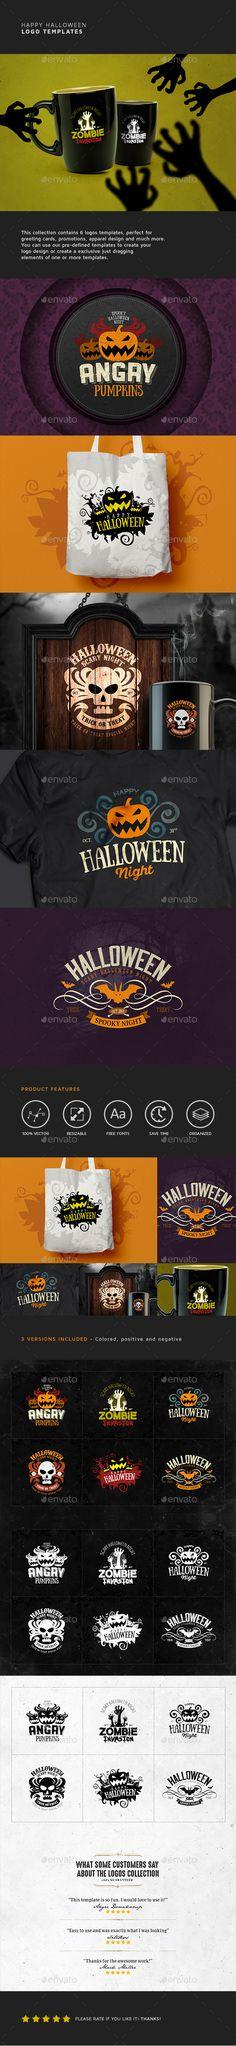 Happy Halloween Badge Logo Design Templates - Badges & Stickers Web Elements Template PSD. Download here: https://graphicriver.net/item/happy-halloween-logo-templates/17912834?ref=yinkira